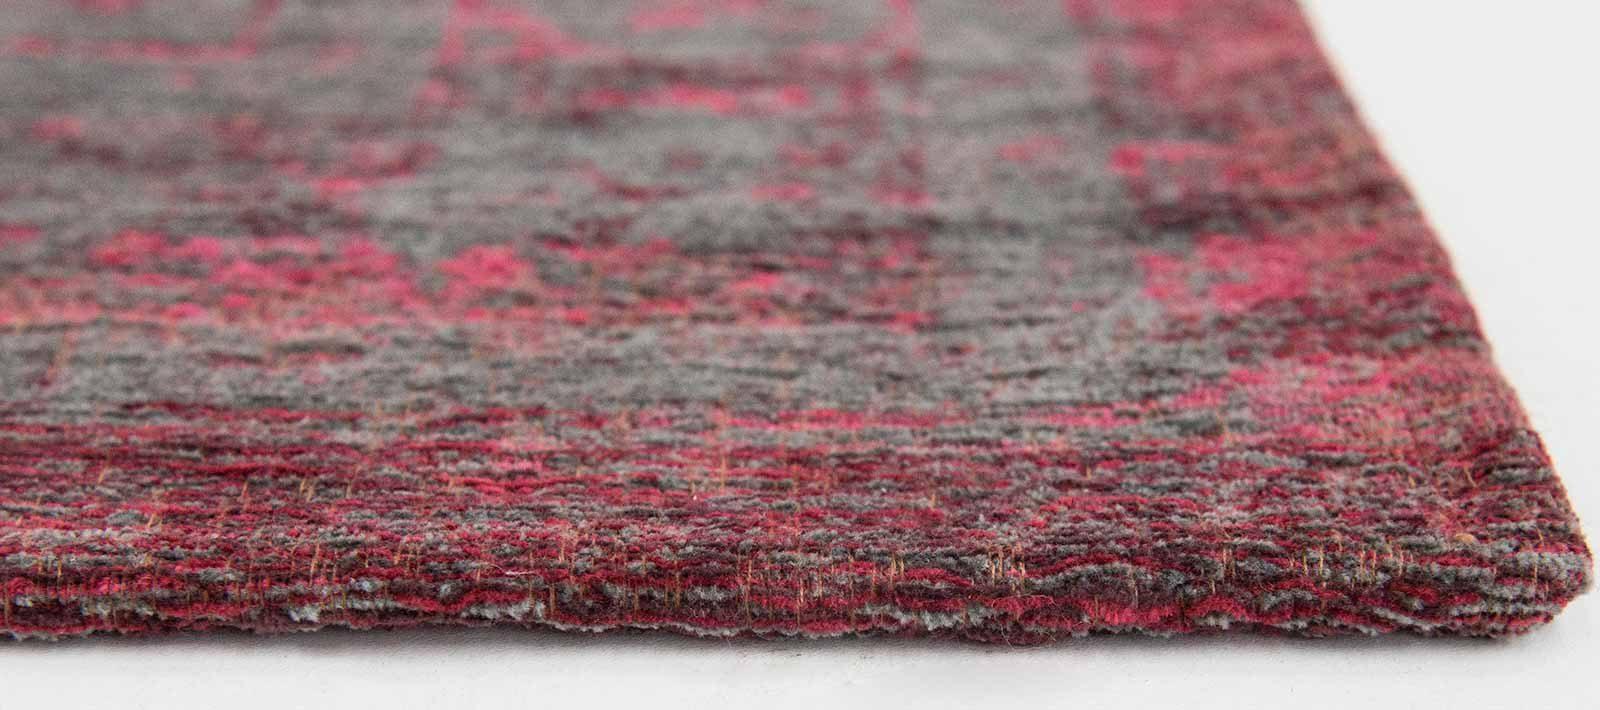 rug Louis De Poortere LX8261 Fading World Medaillon Pink Flash size